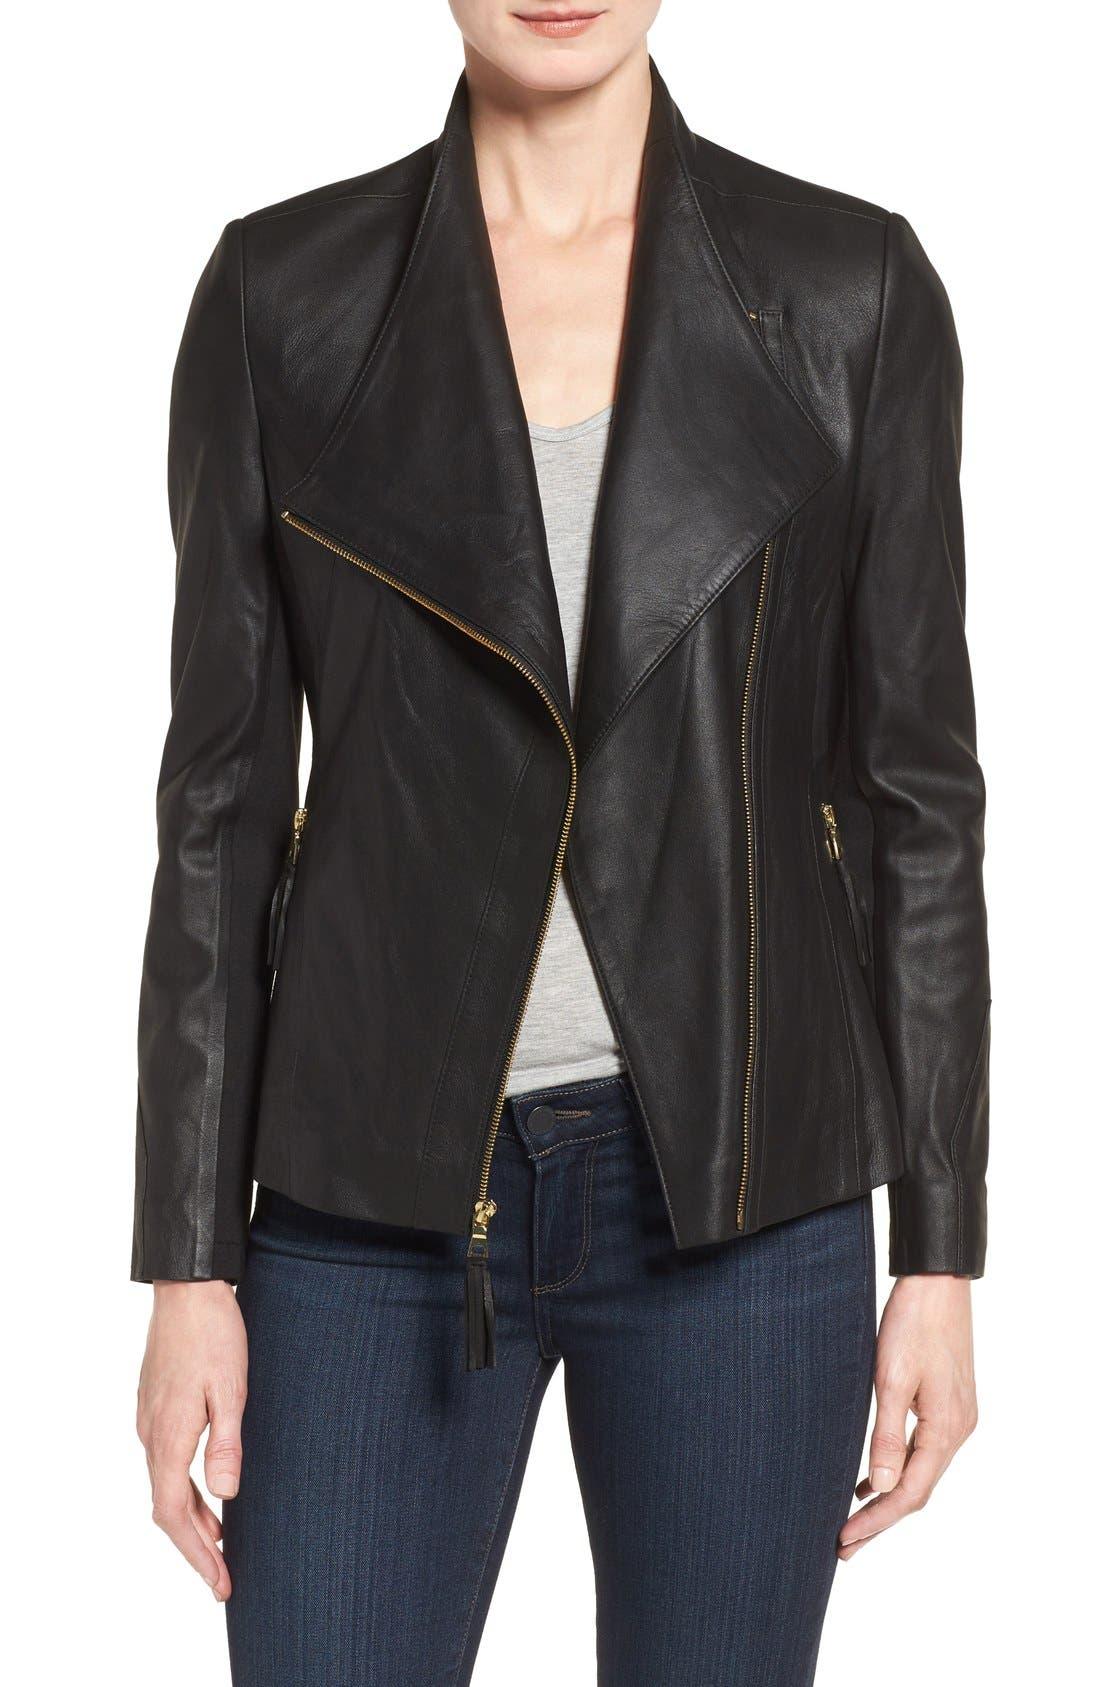 Alternate Image 1 Selected - Via Spiga Asymmetrical Leather Jacket